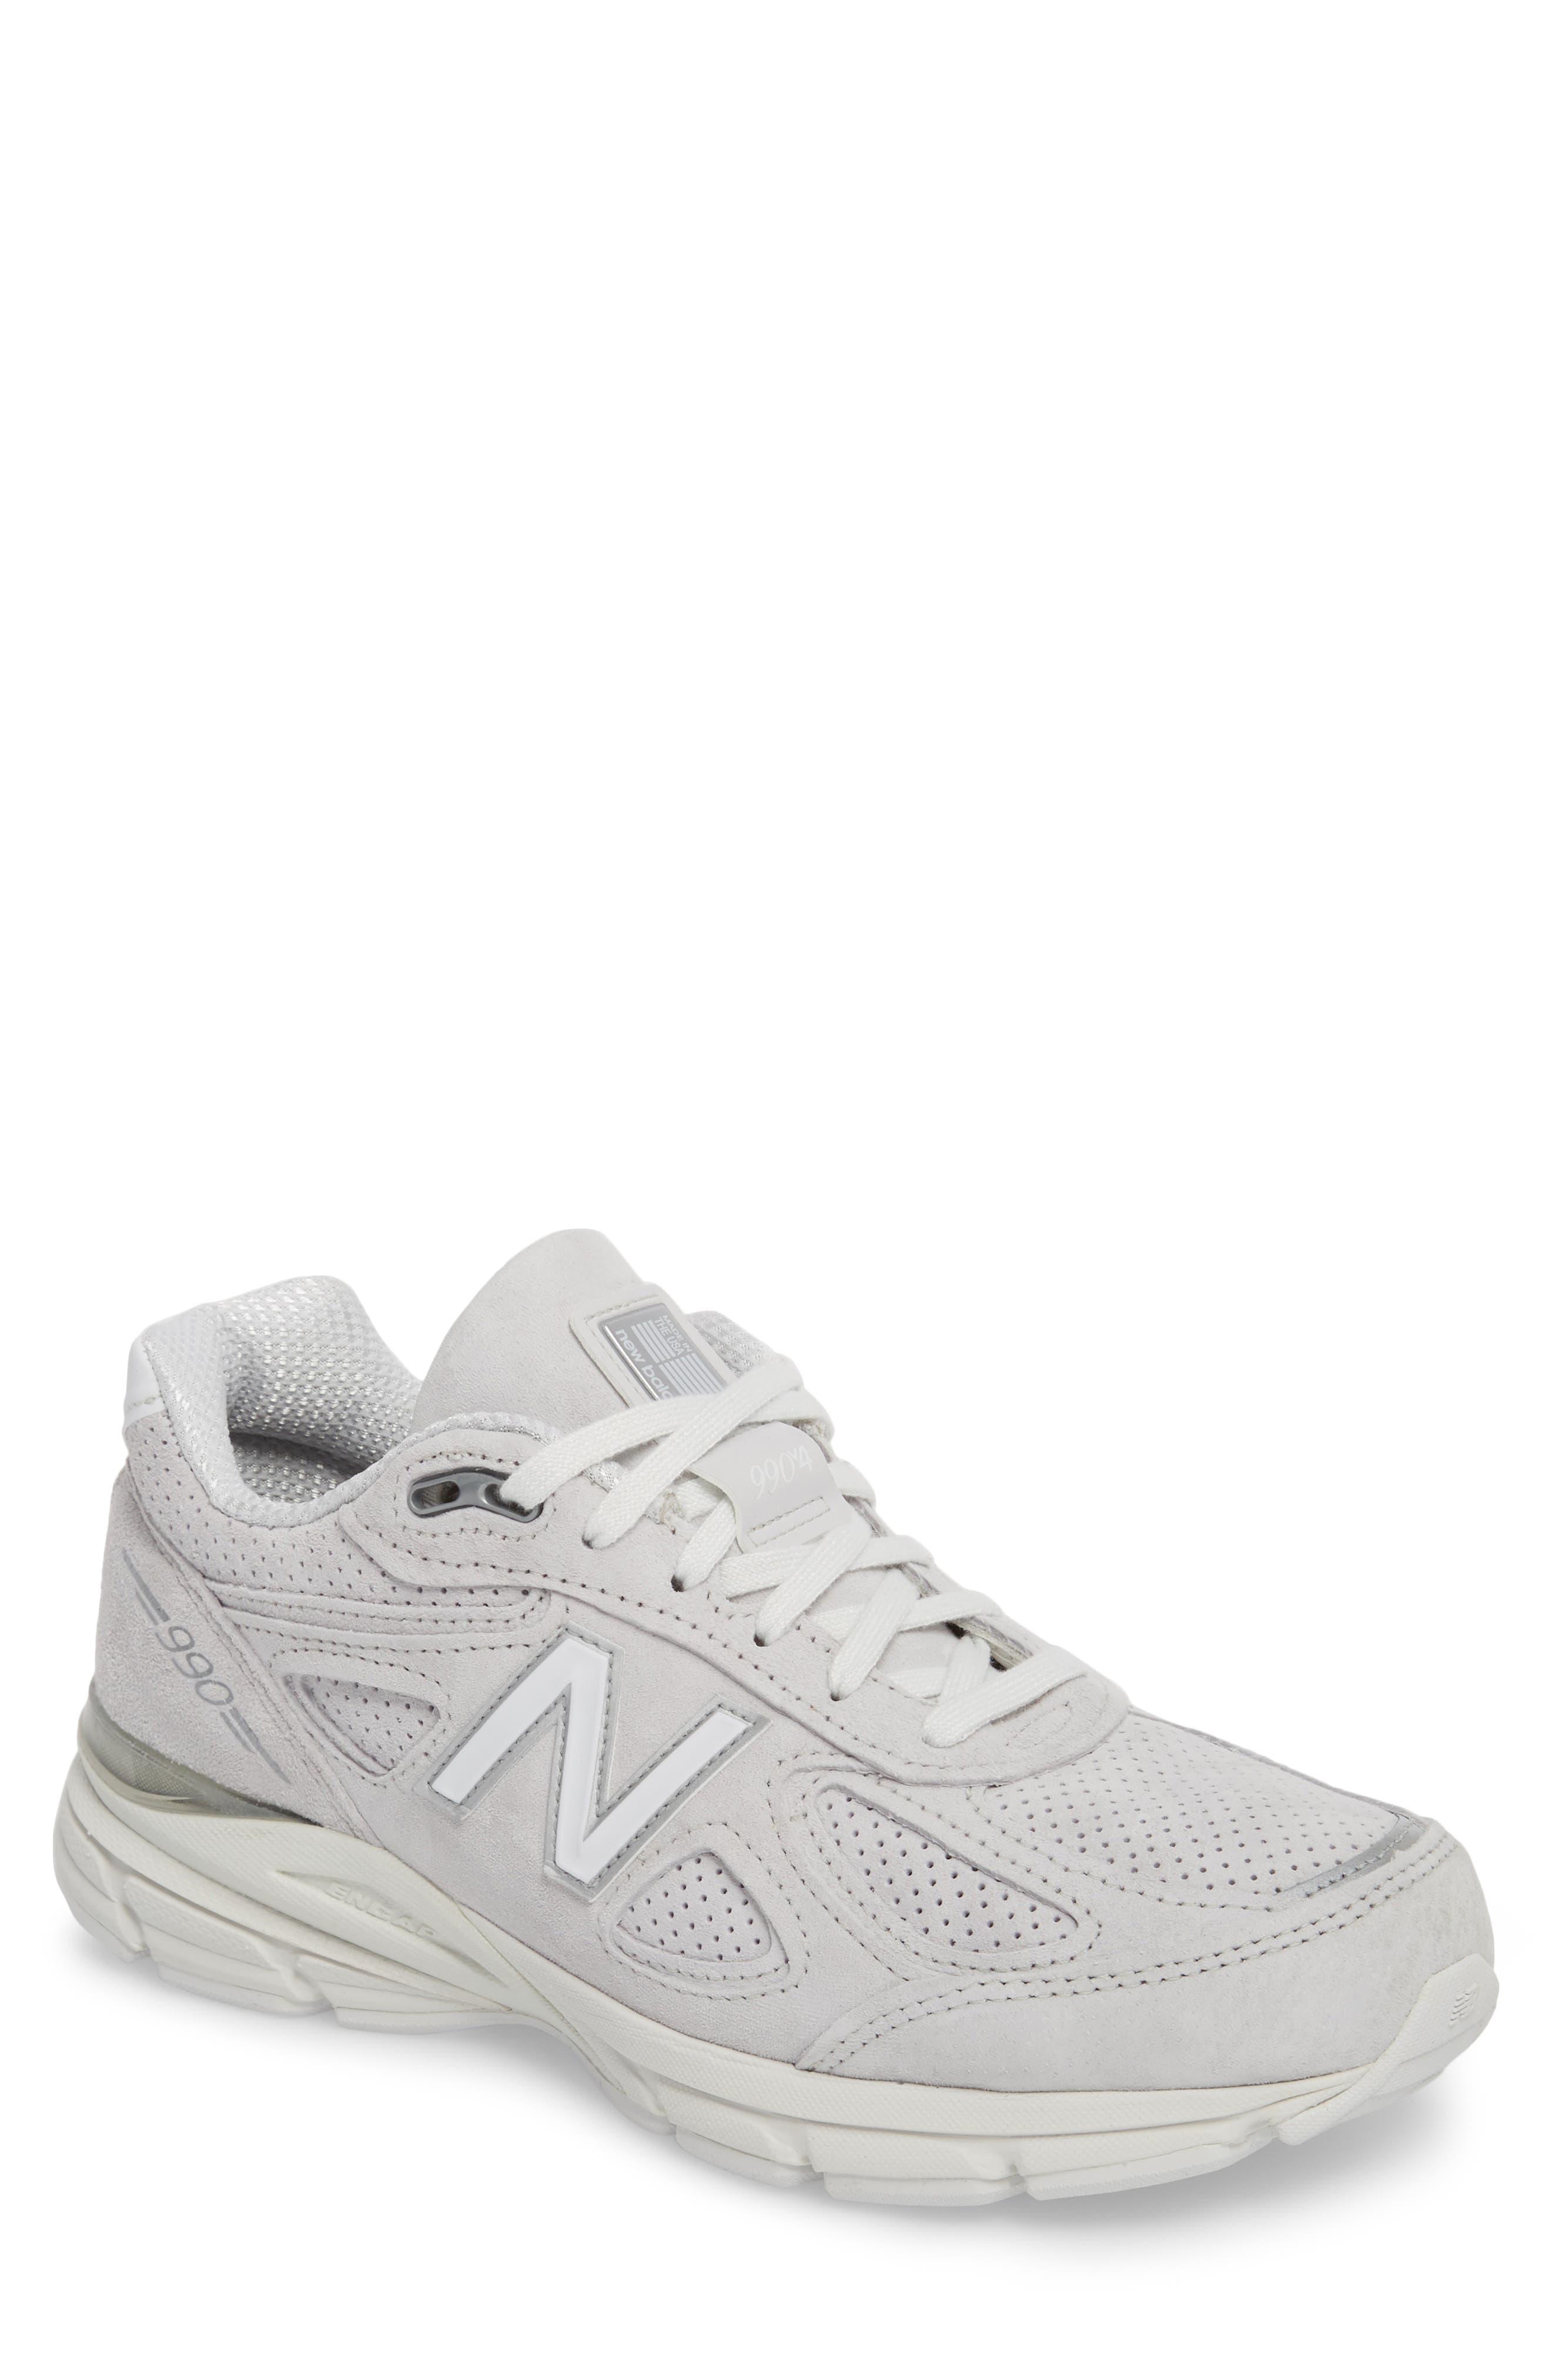 New Balance 990v4 Perforated Sneaker (Men)